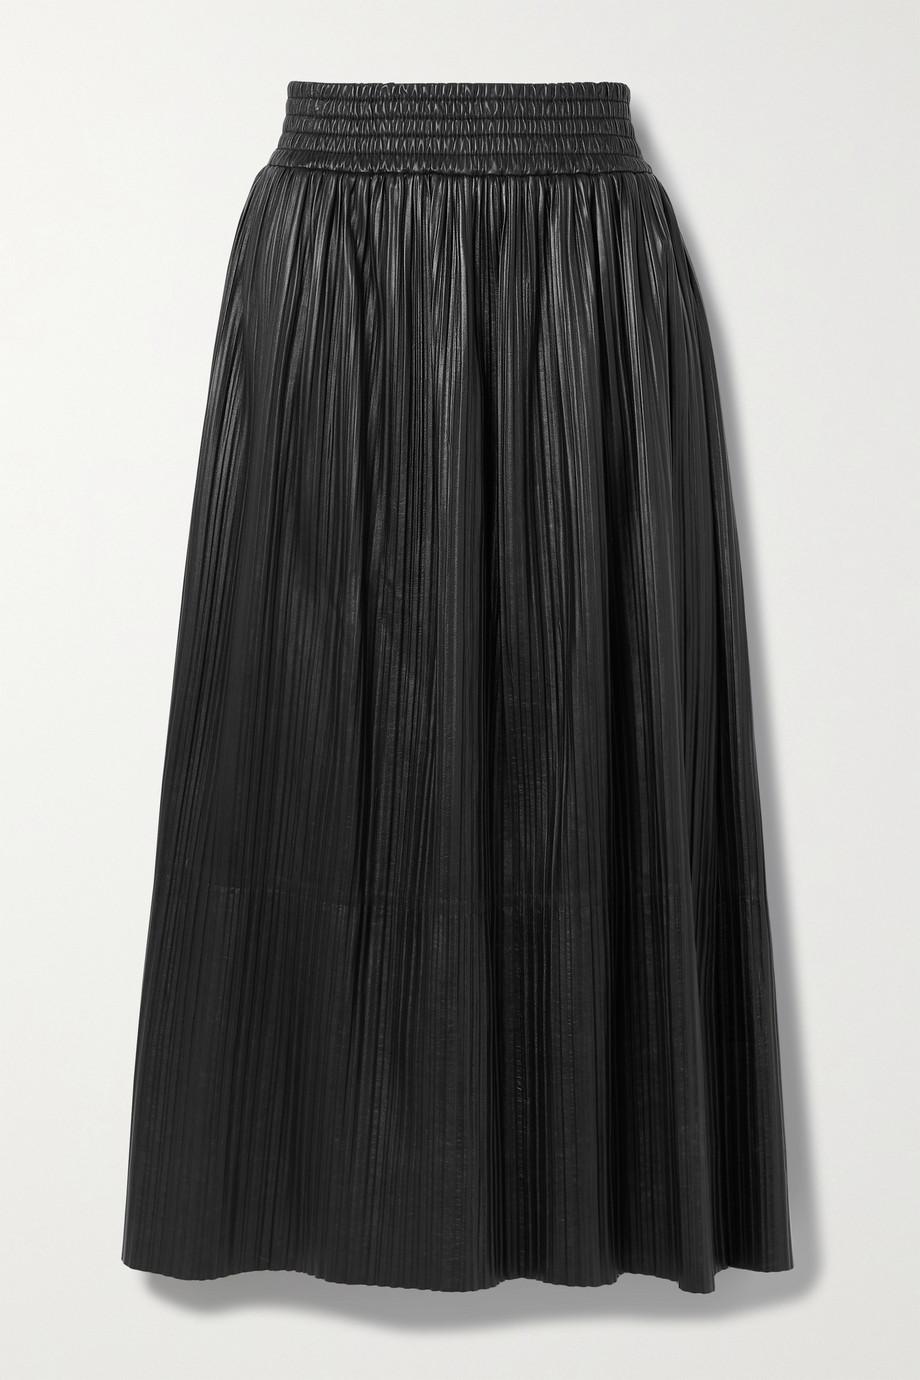 Gabriela Hearst + NET SUSTAIN Dakota pleated leather midi skirt